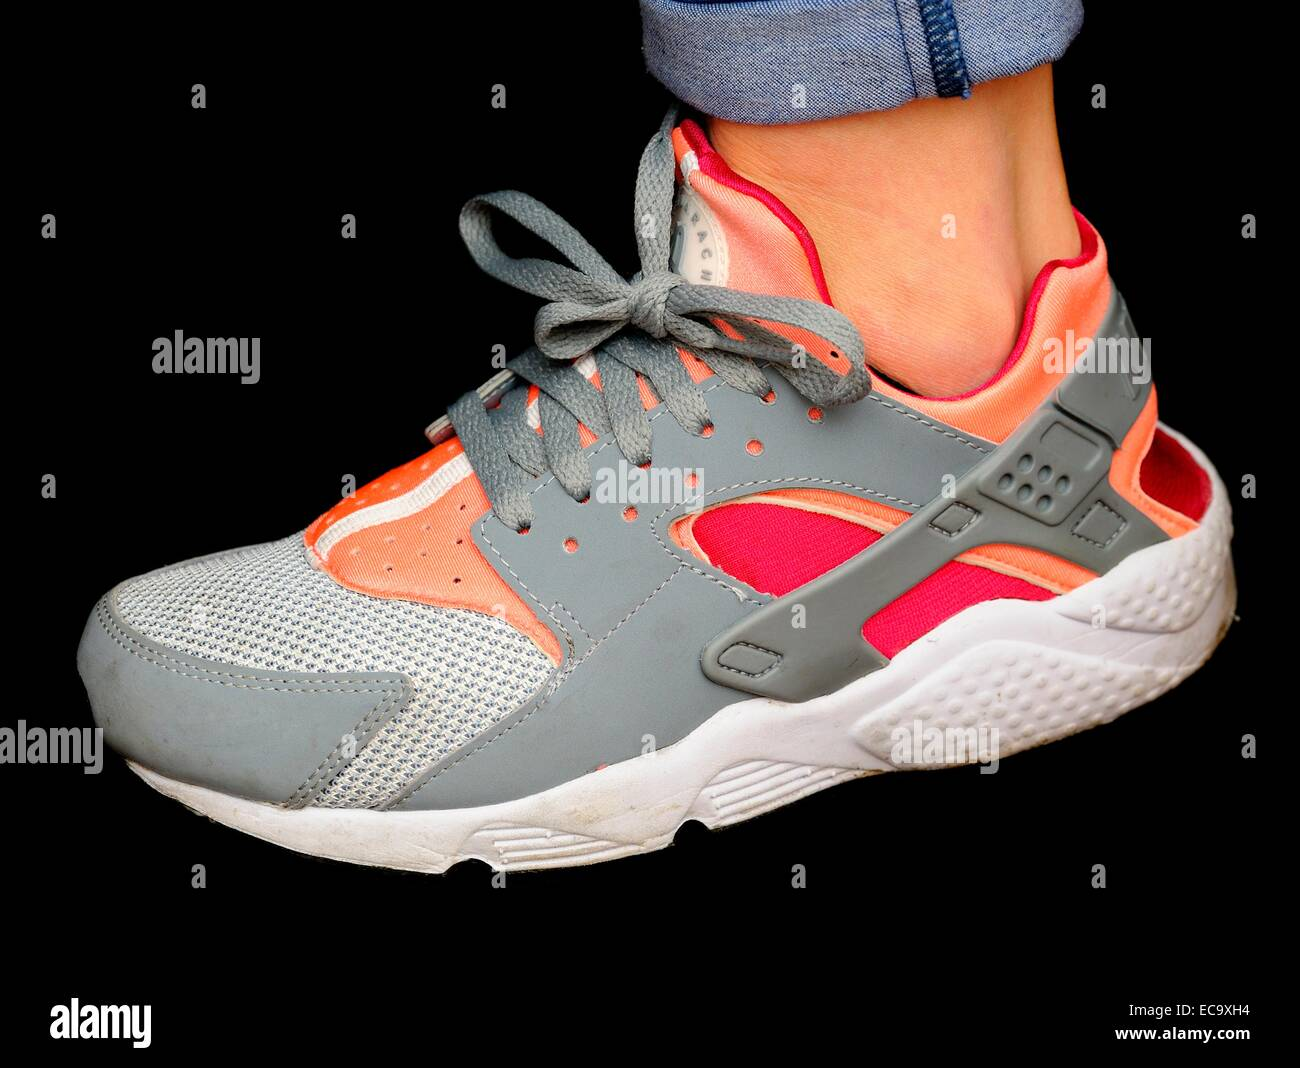 Schwarzer Nike Bilder Stockfotosamp; Alamy Schuh SMpGLUzqV